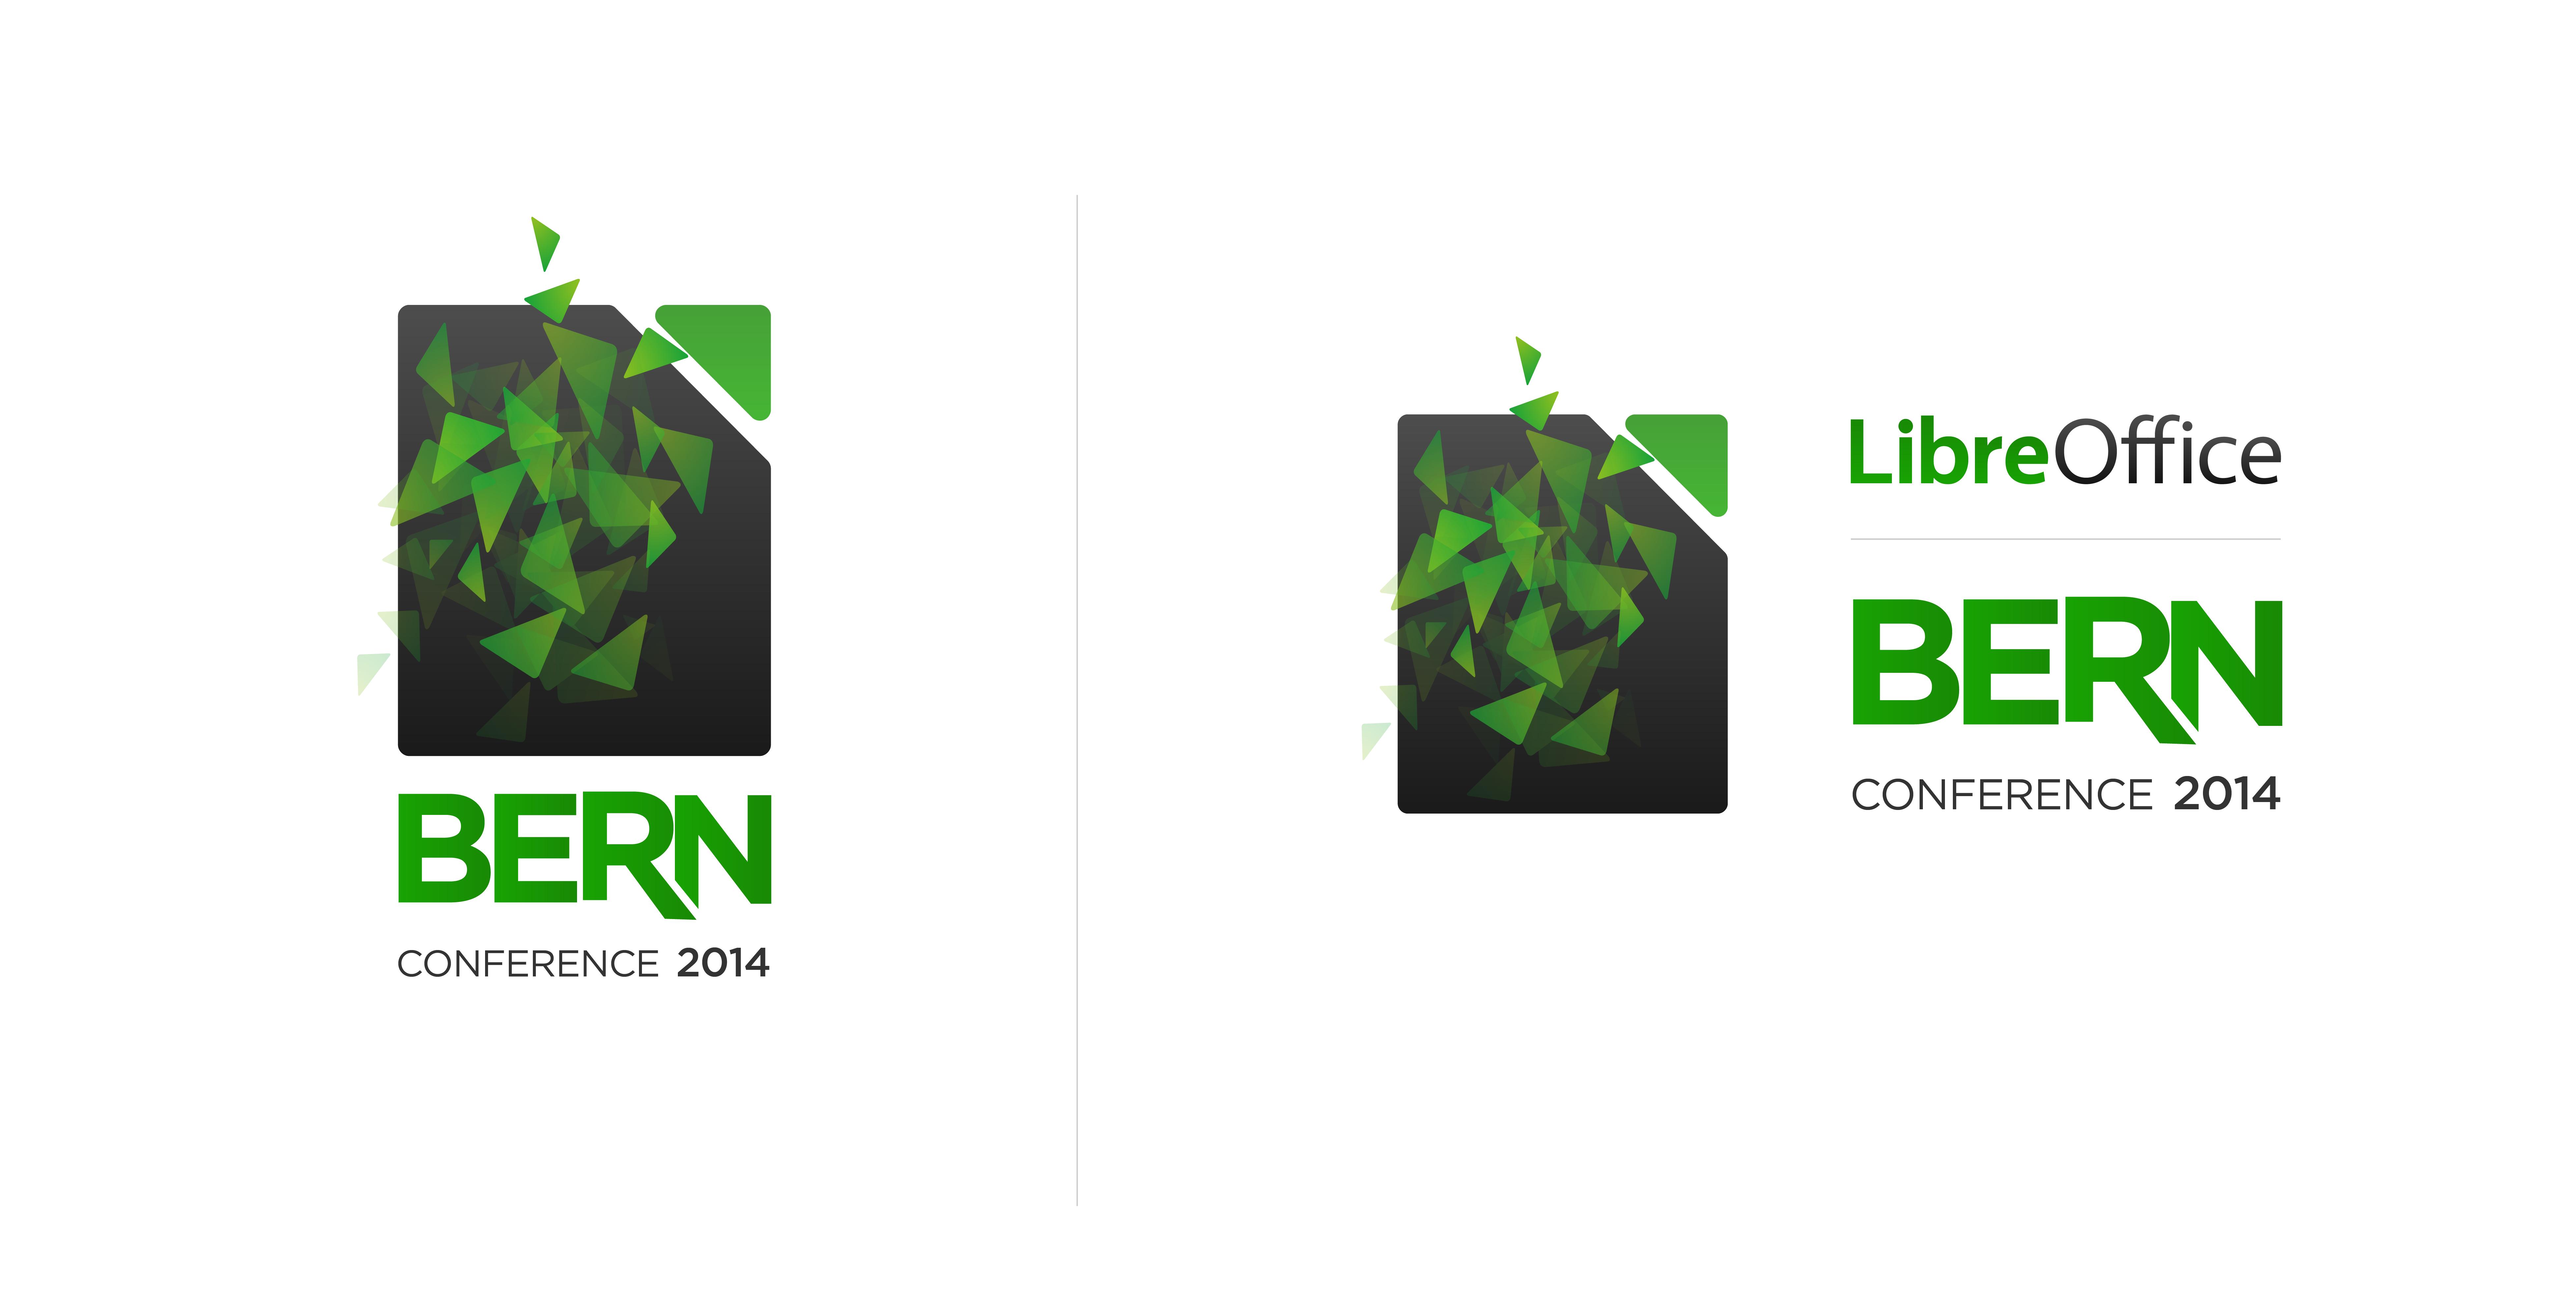 bern-logo-07.png